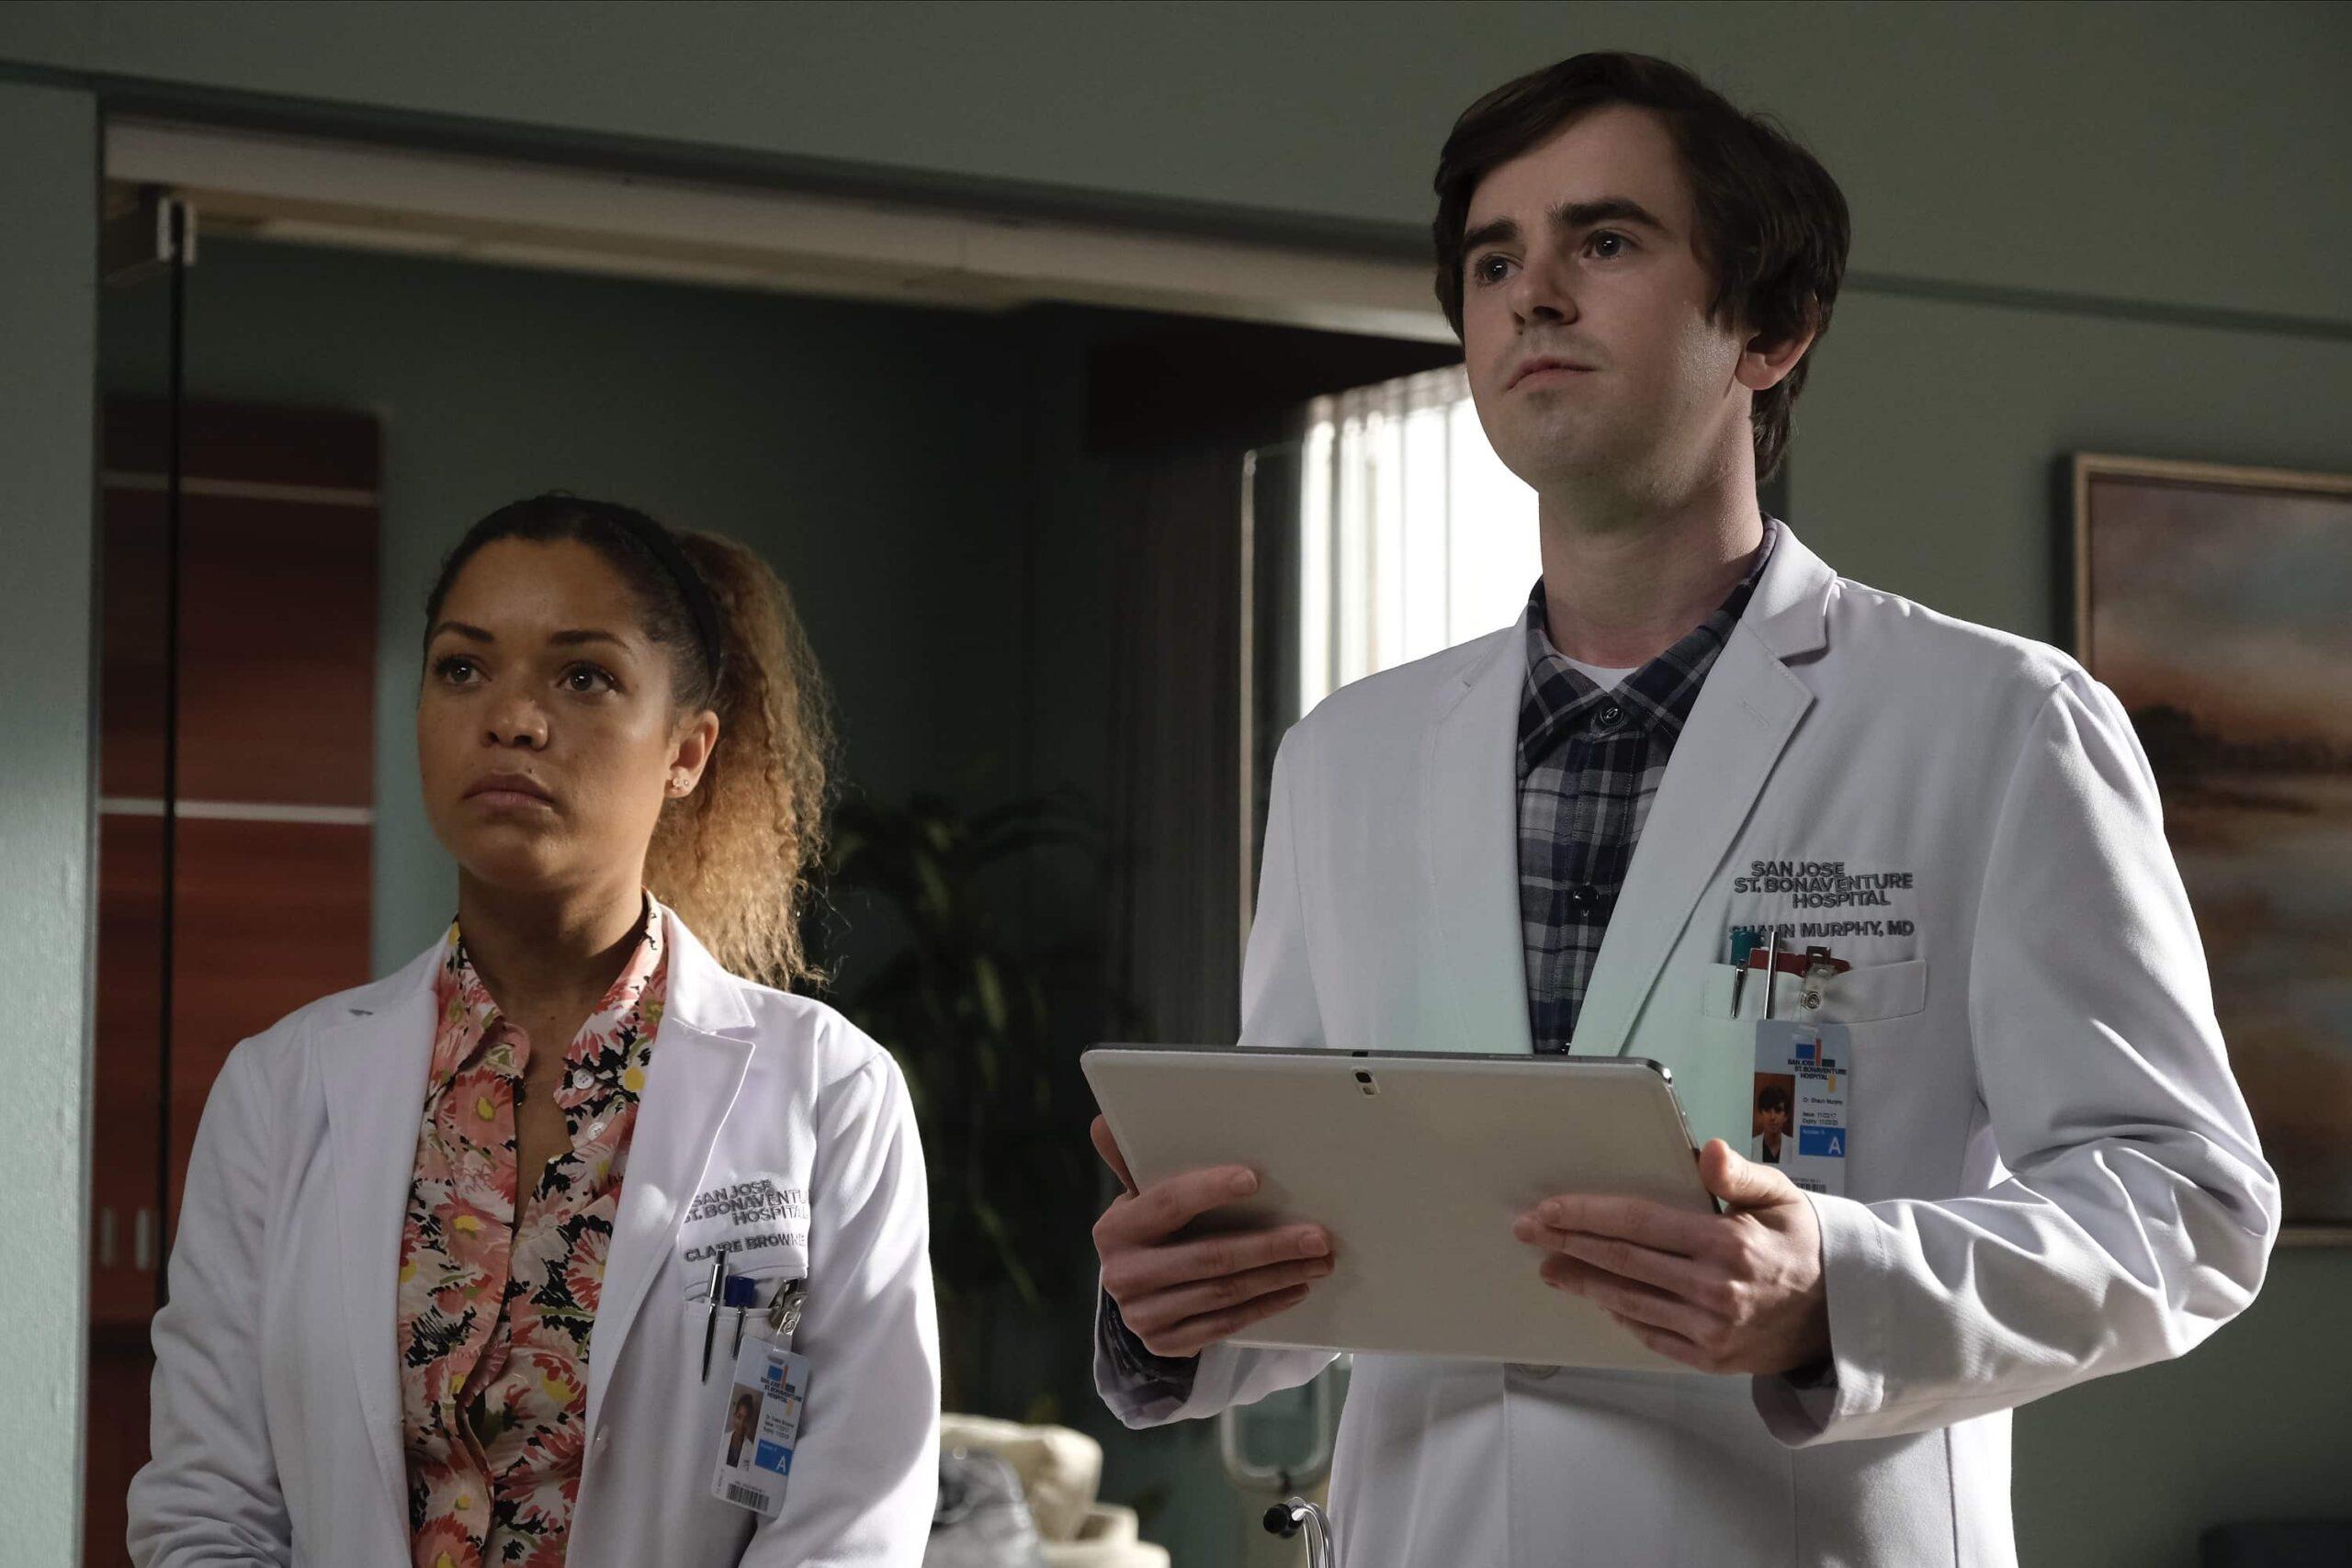 THE GOOD DOCTOR Season 4 Episode 12 Photos Teeny Blue Eyes ANTONIA THOMAS, FREDDIE HIGHMORE